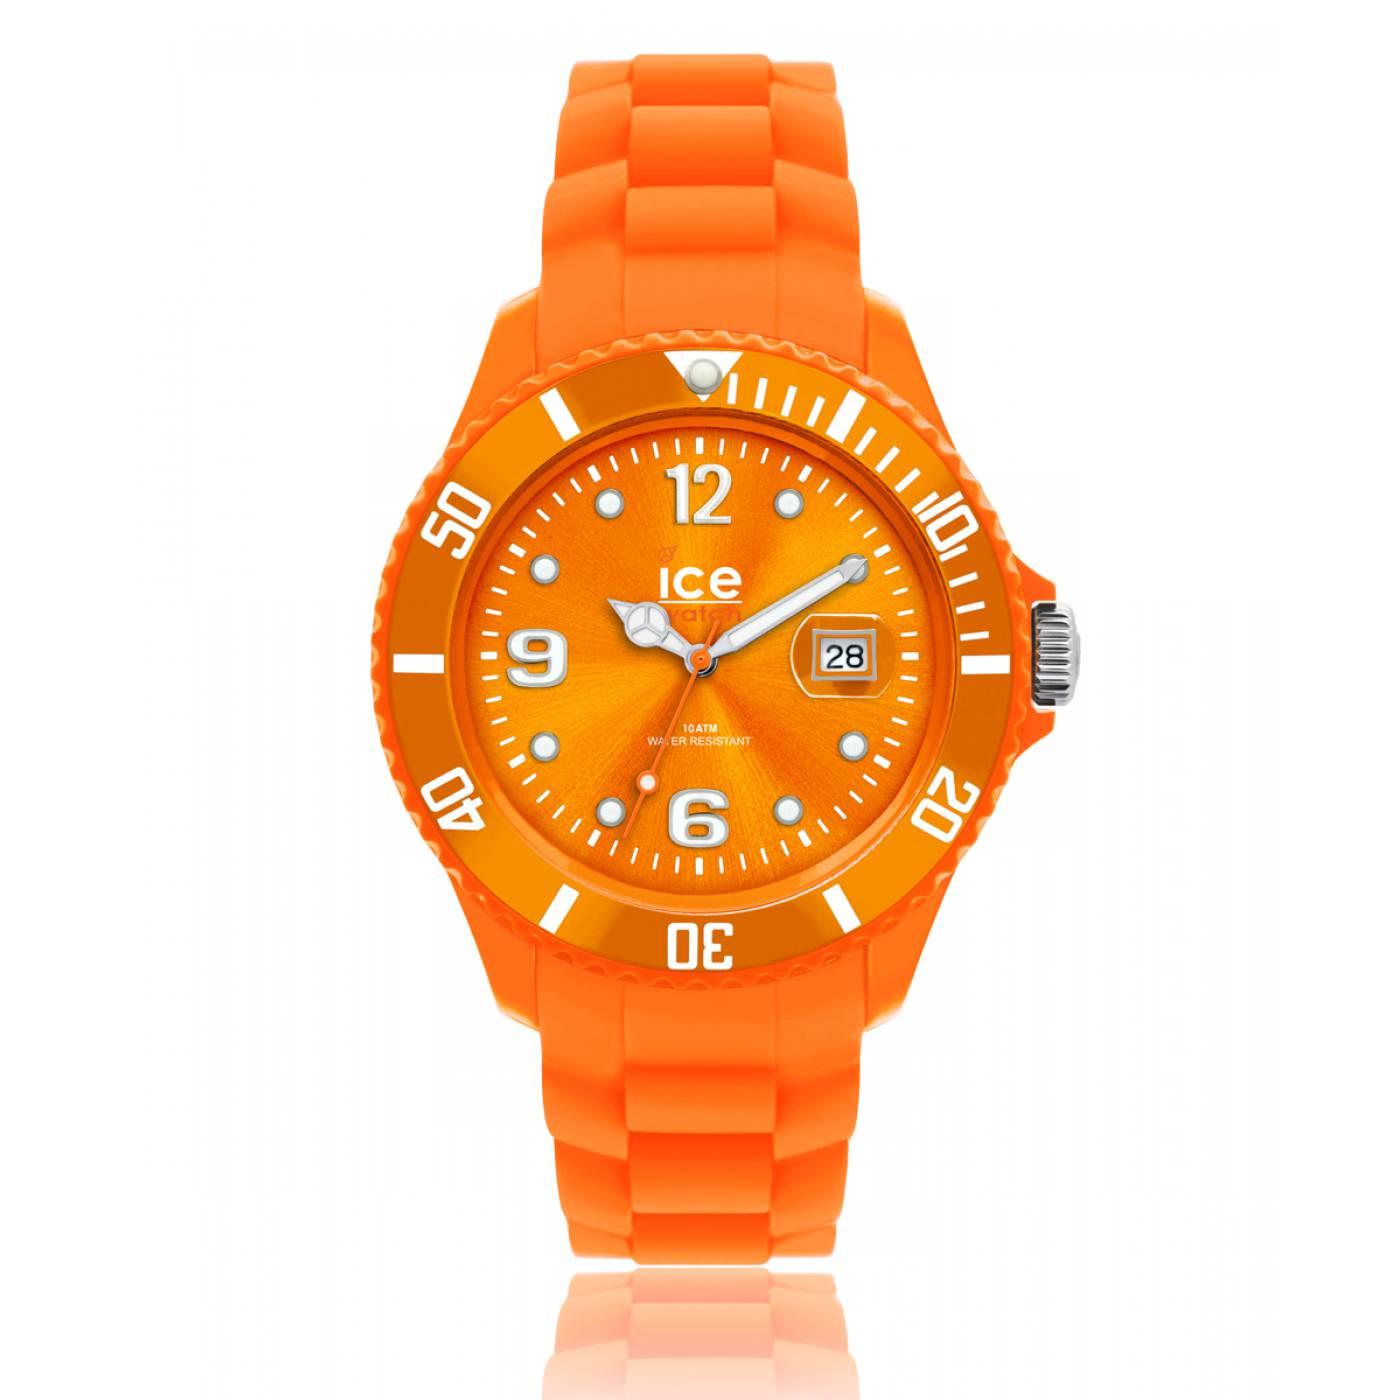 montre homme femme ice forever silicone orange ice watch. Black Bedroom Furniture Sets. Home Design Ideas